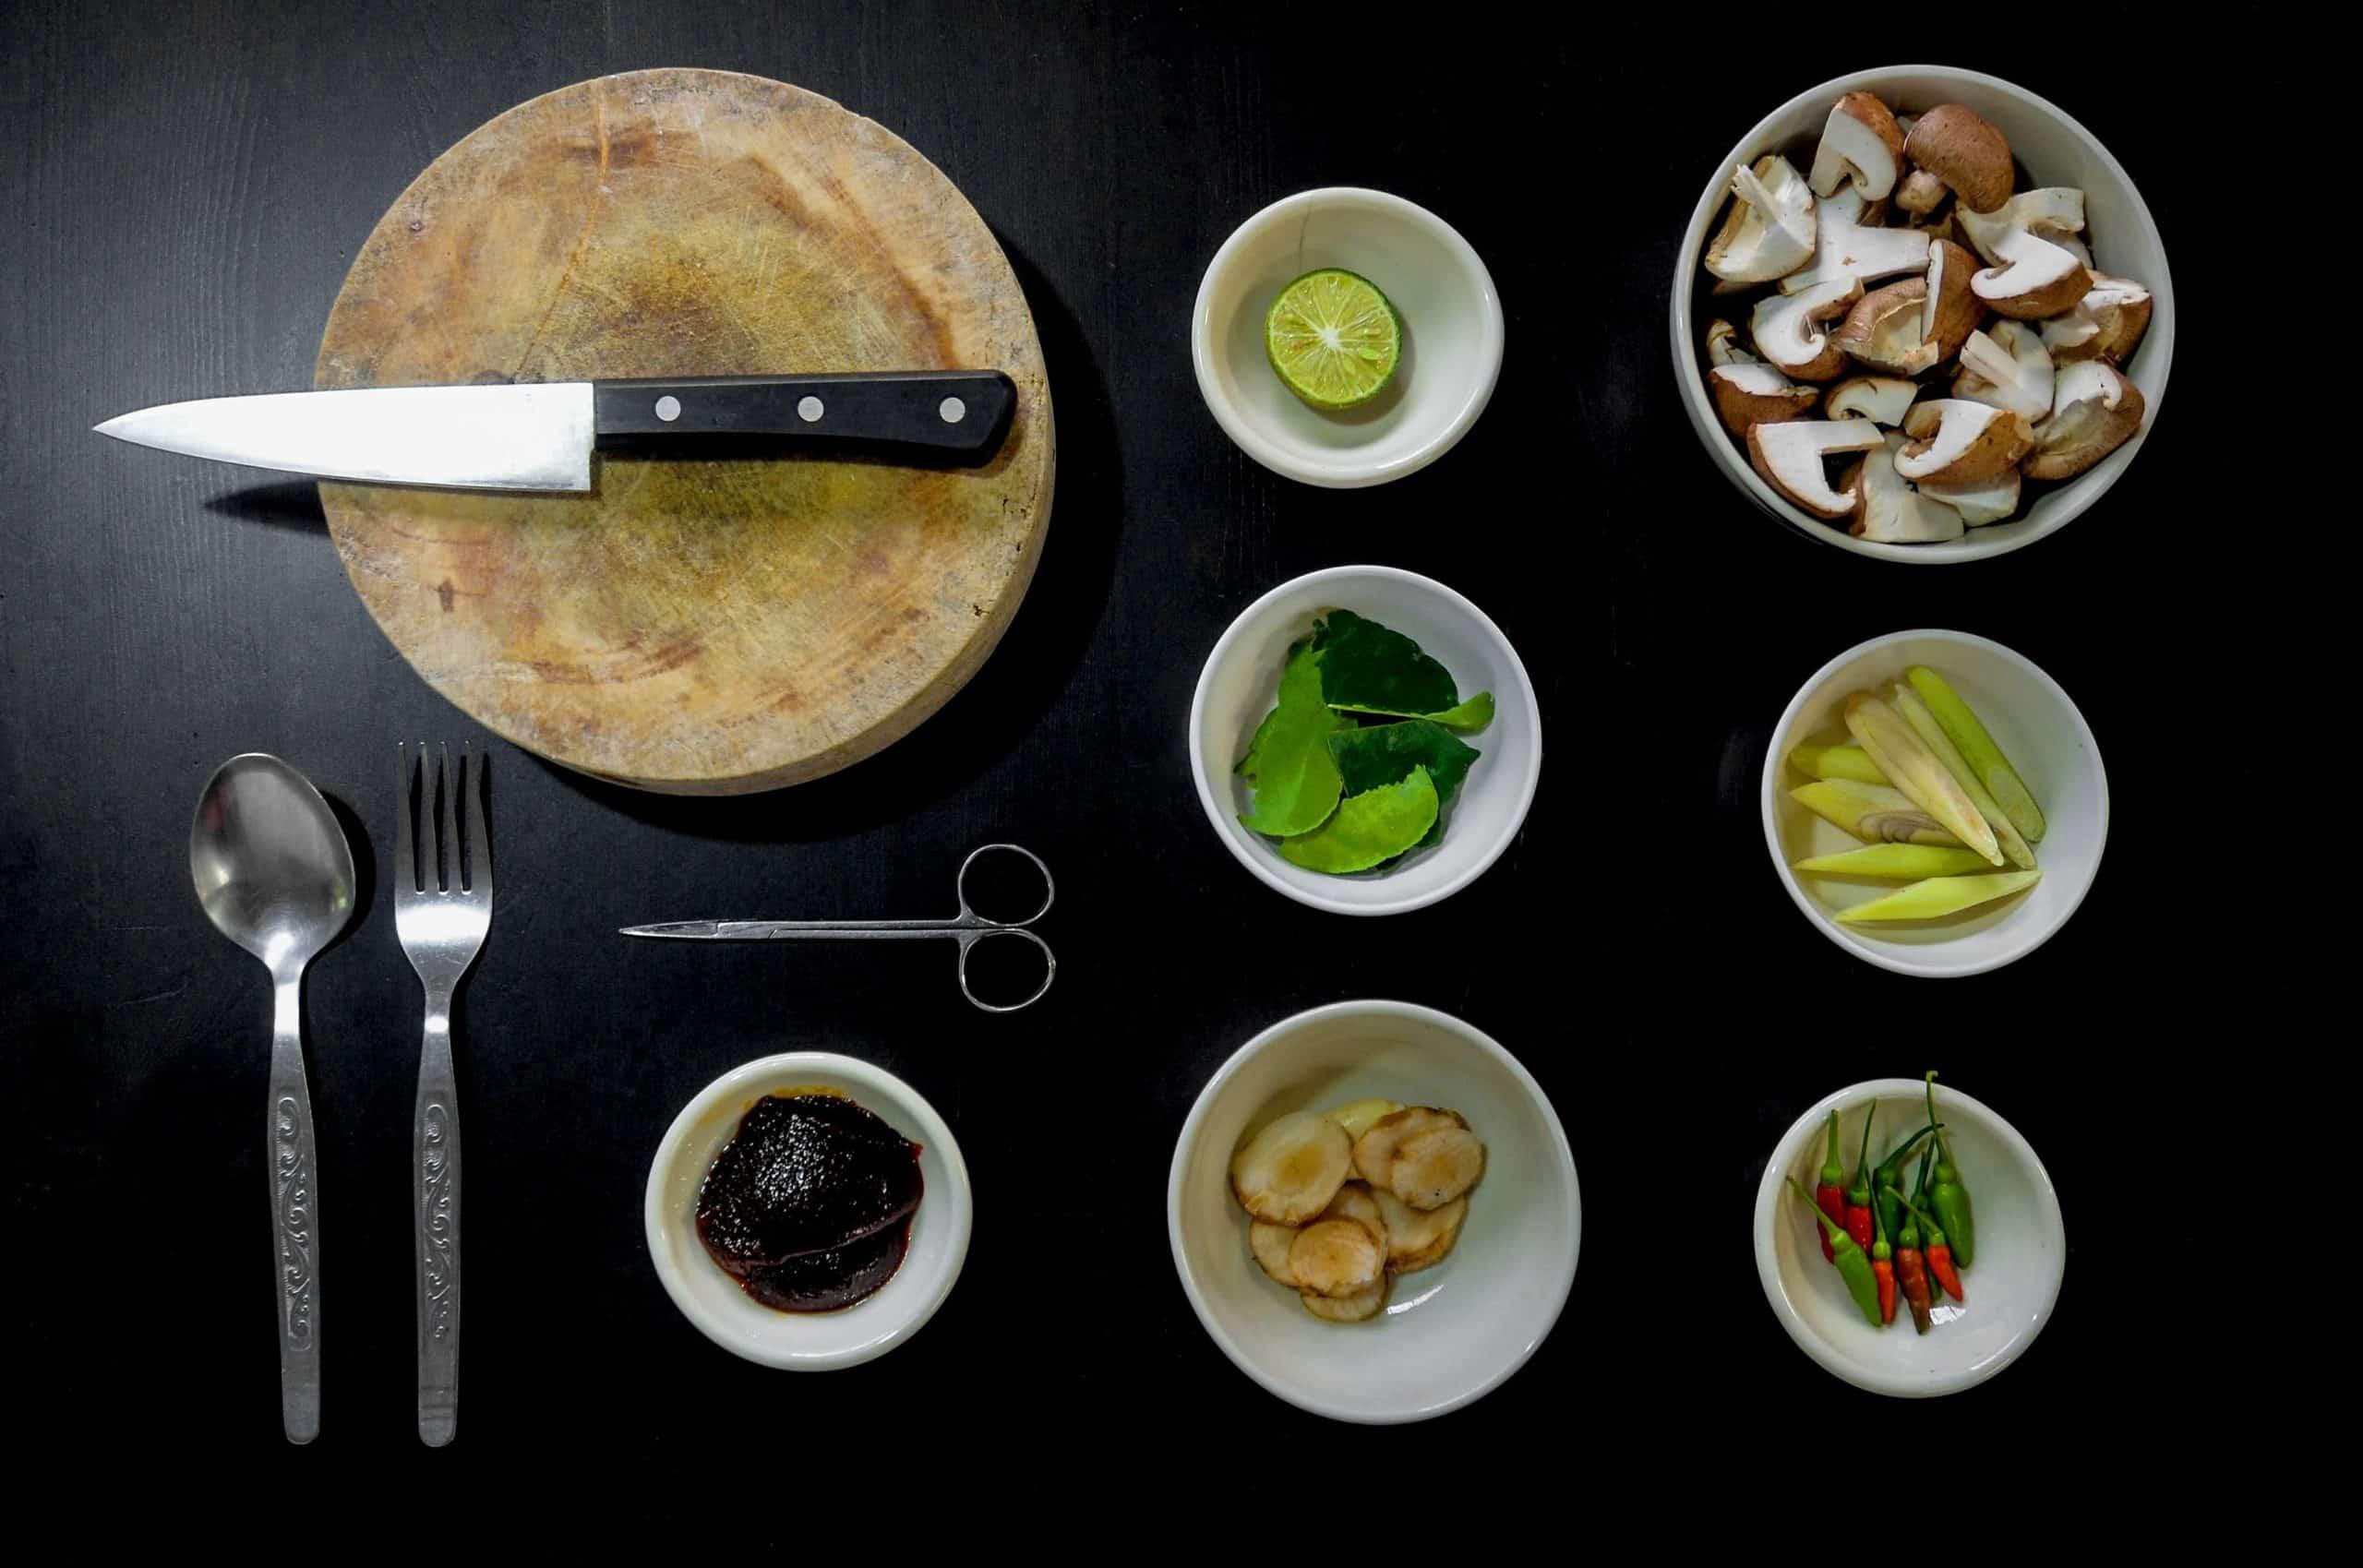 The Top 20 Vegetarian Restaurants In The World